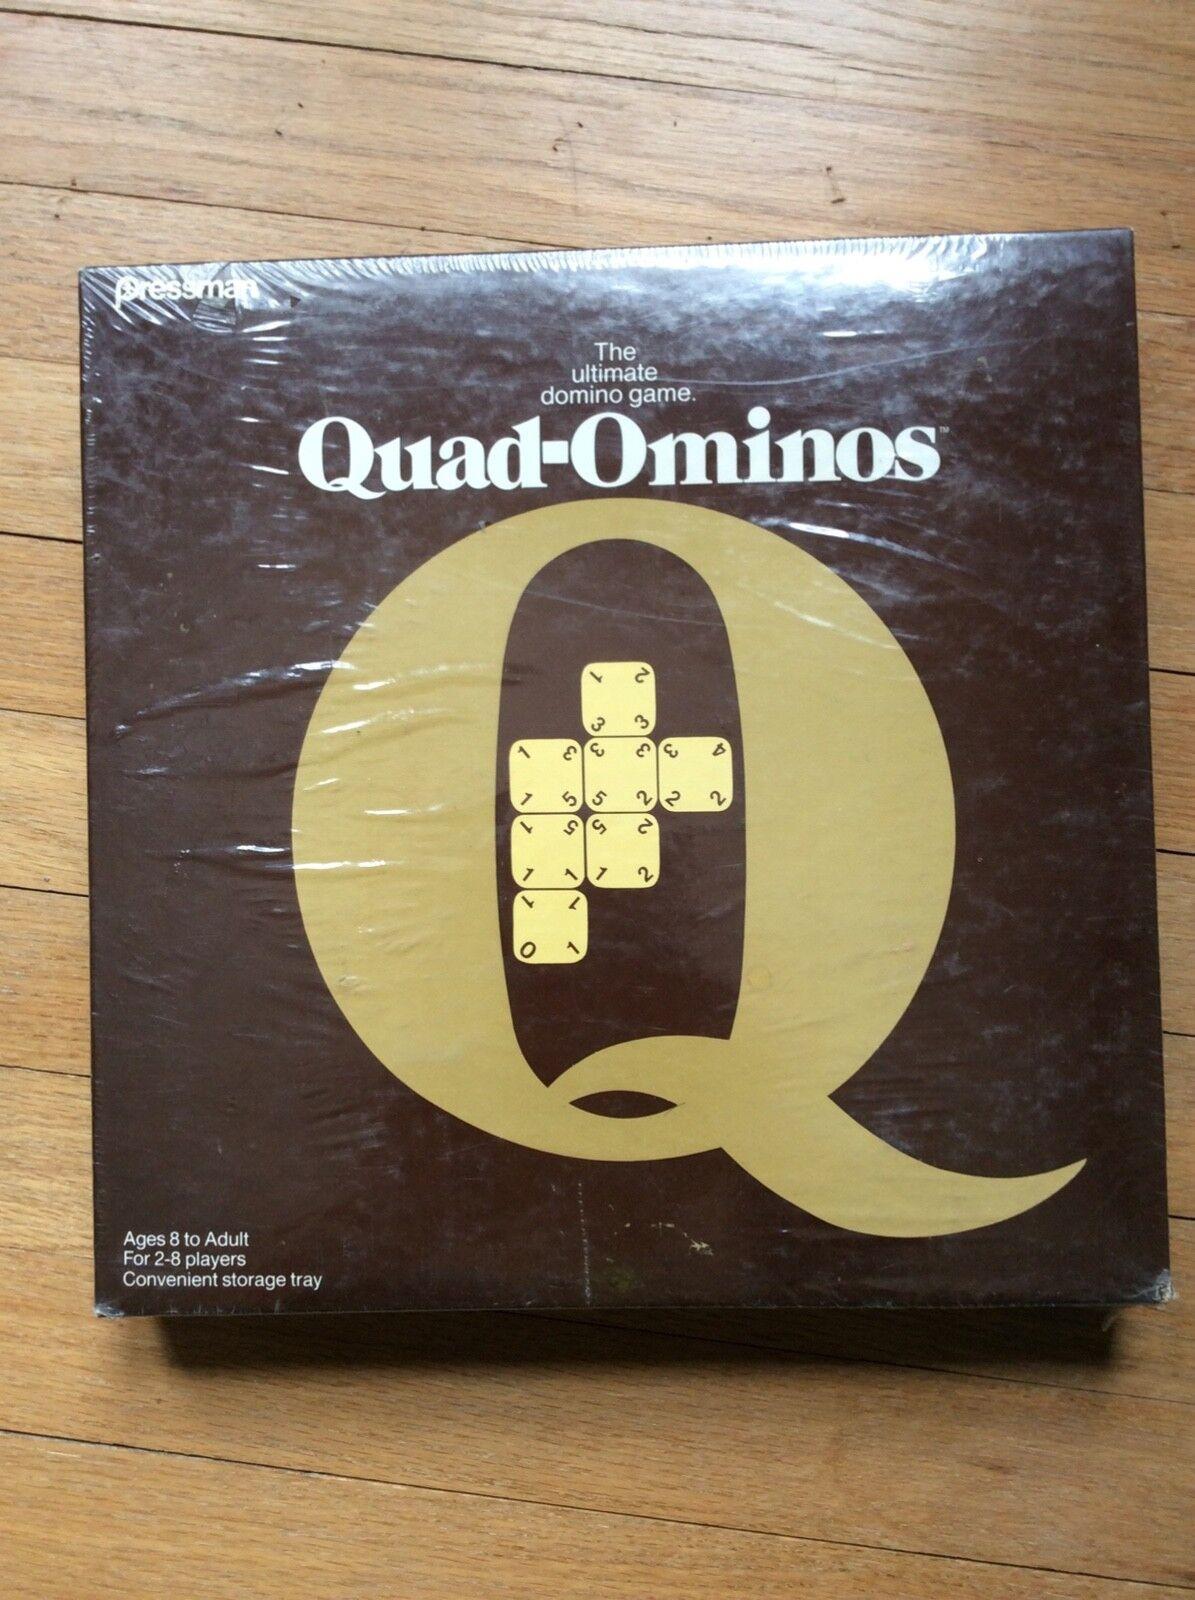 Neue versiegelt quad-ominos ultimative domino fliesen brettspiel pressman 1978 quadominoes